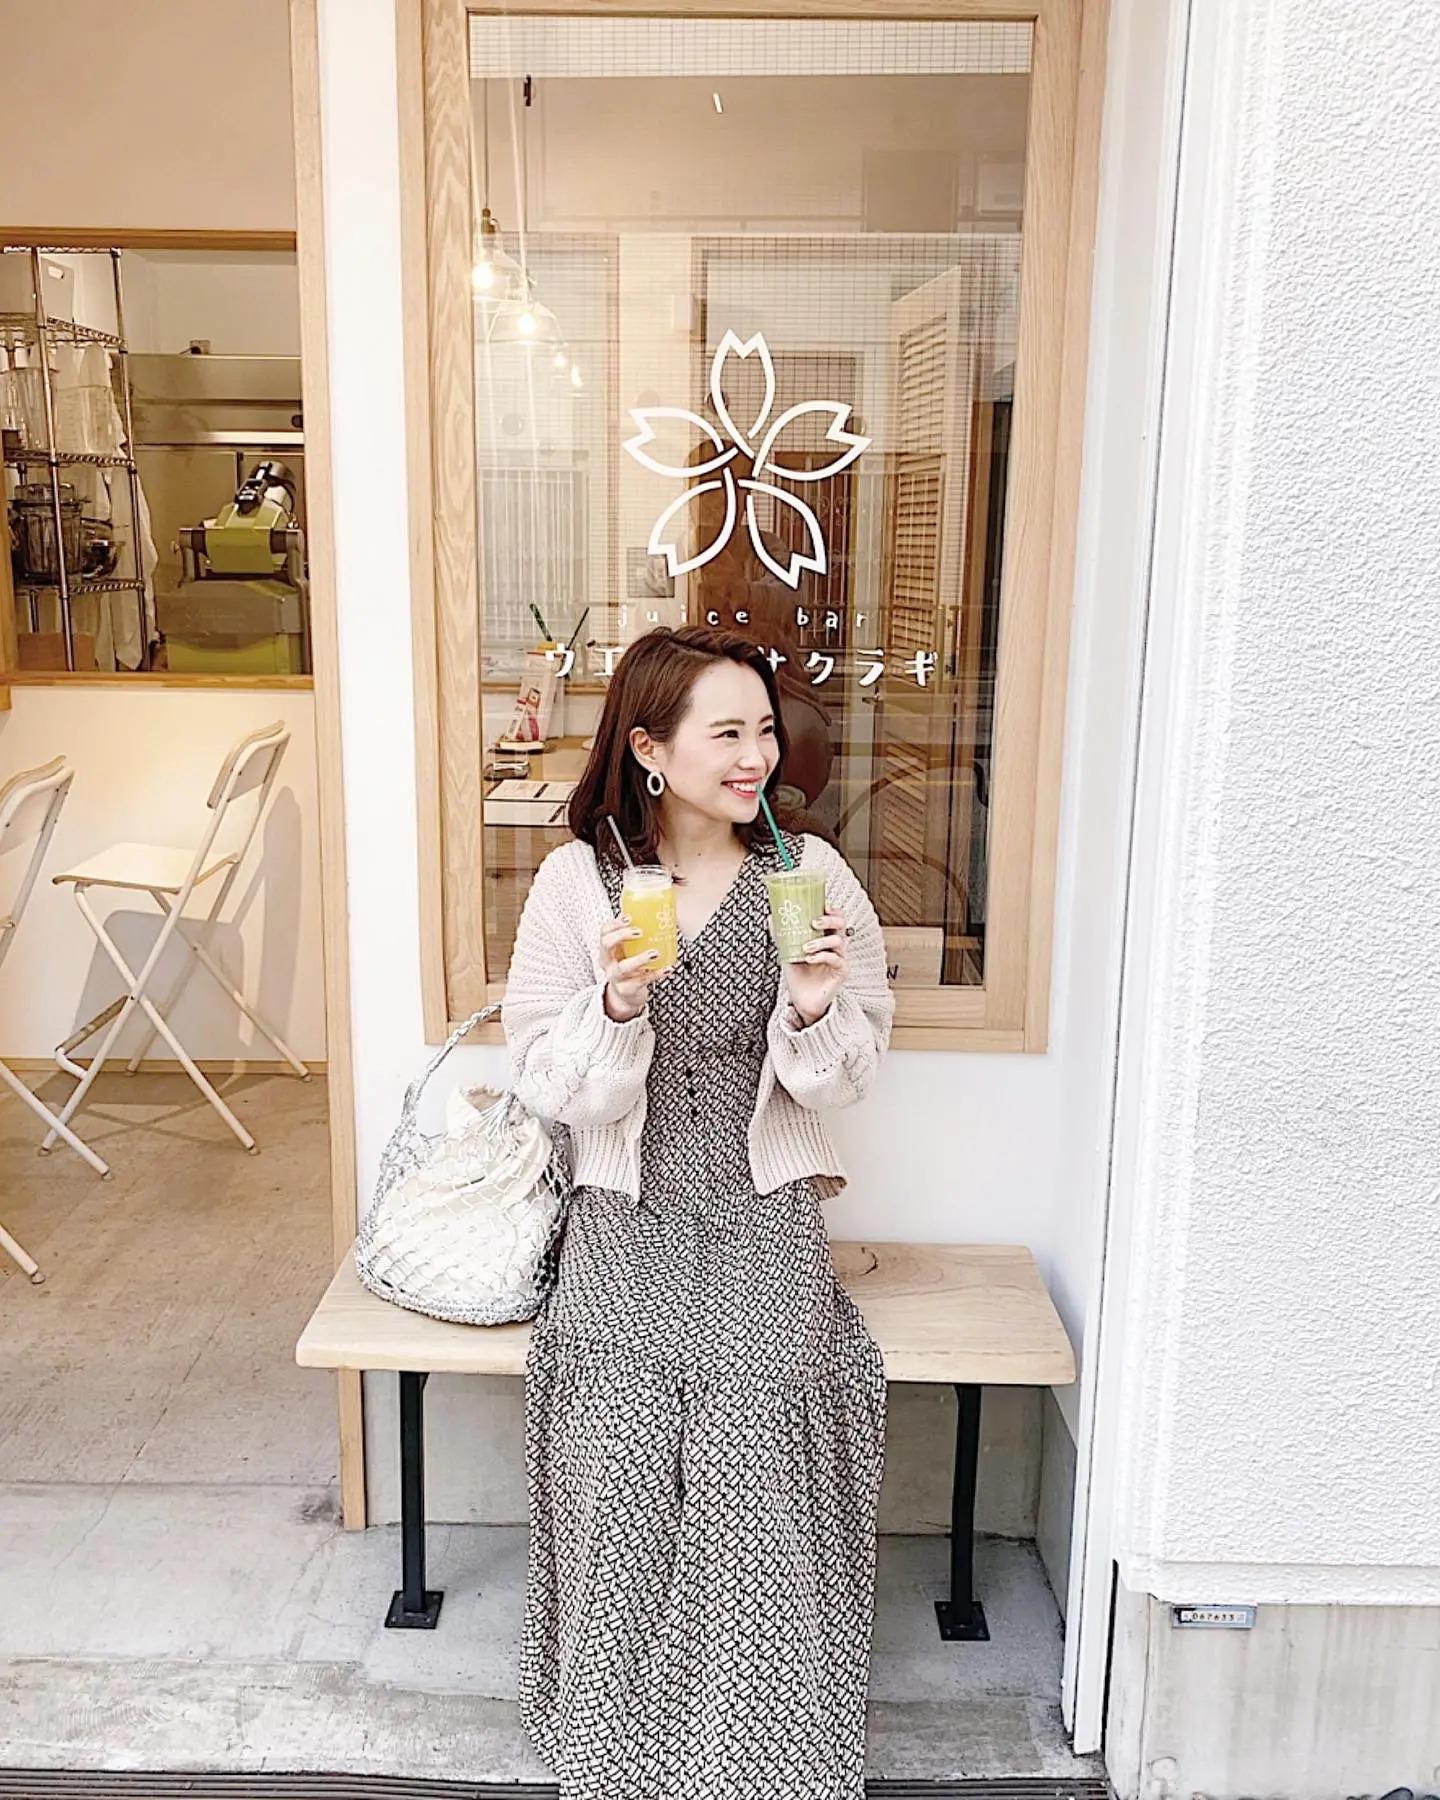 『GU』の新作パジャマ&ナイトブラが可愛いうえに快適すぎる!【今週のMOREインフルエンサーズファッション人気ランキング】_1